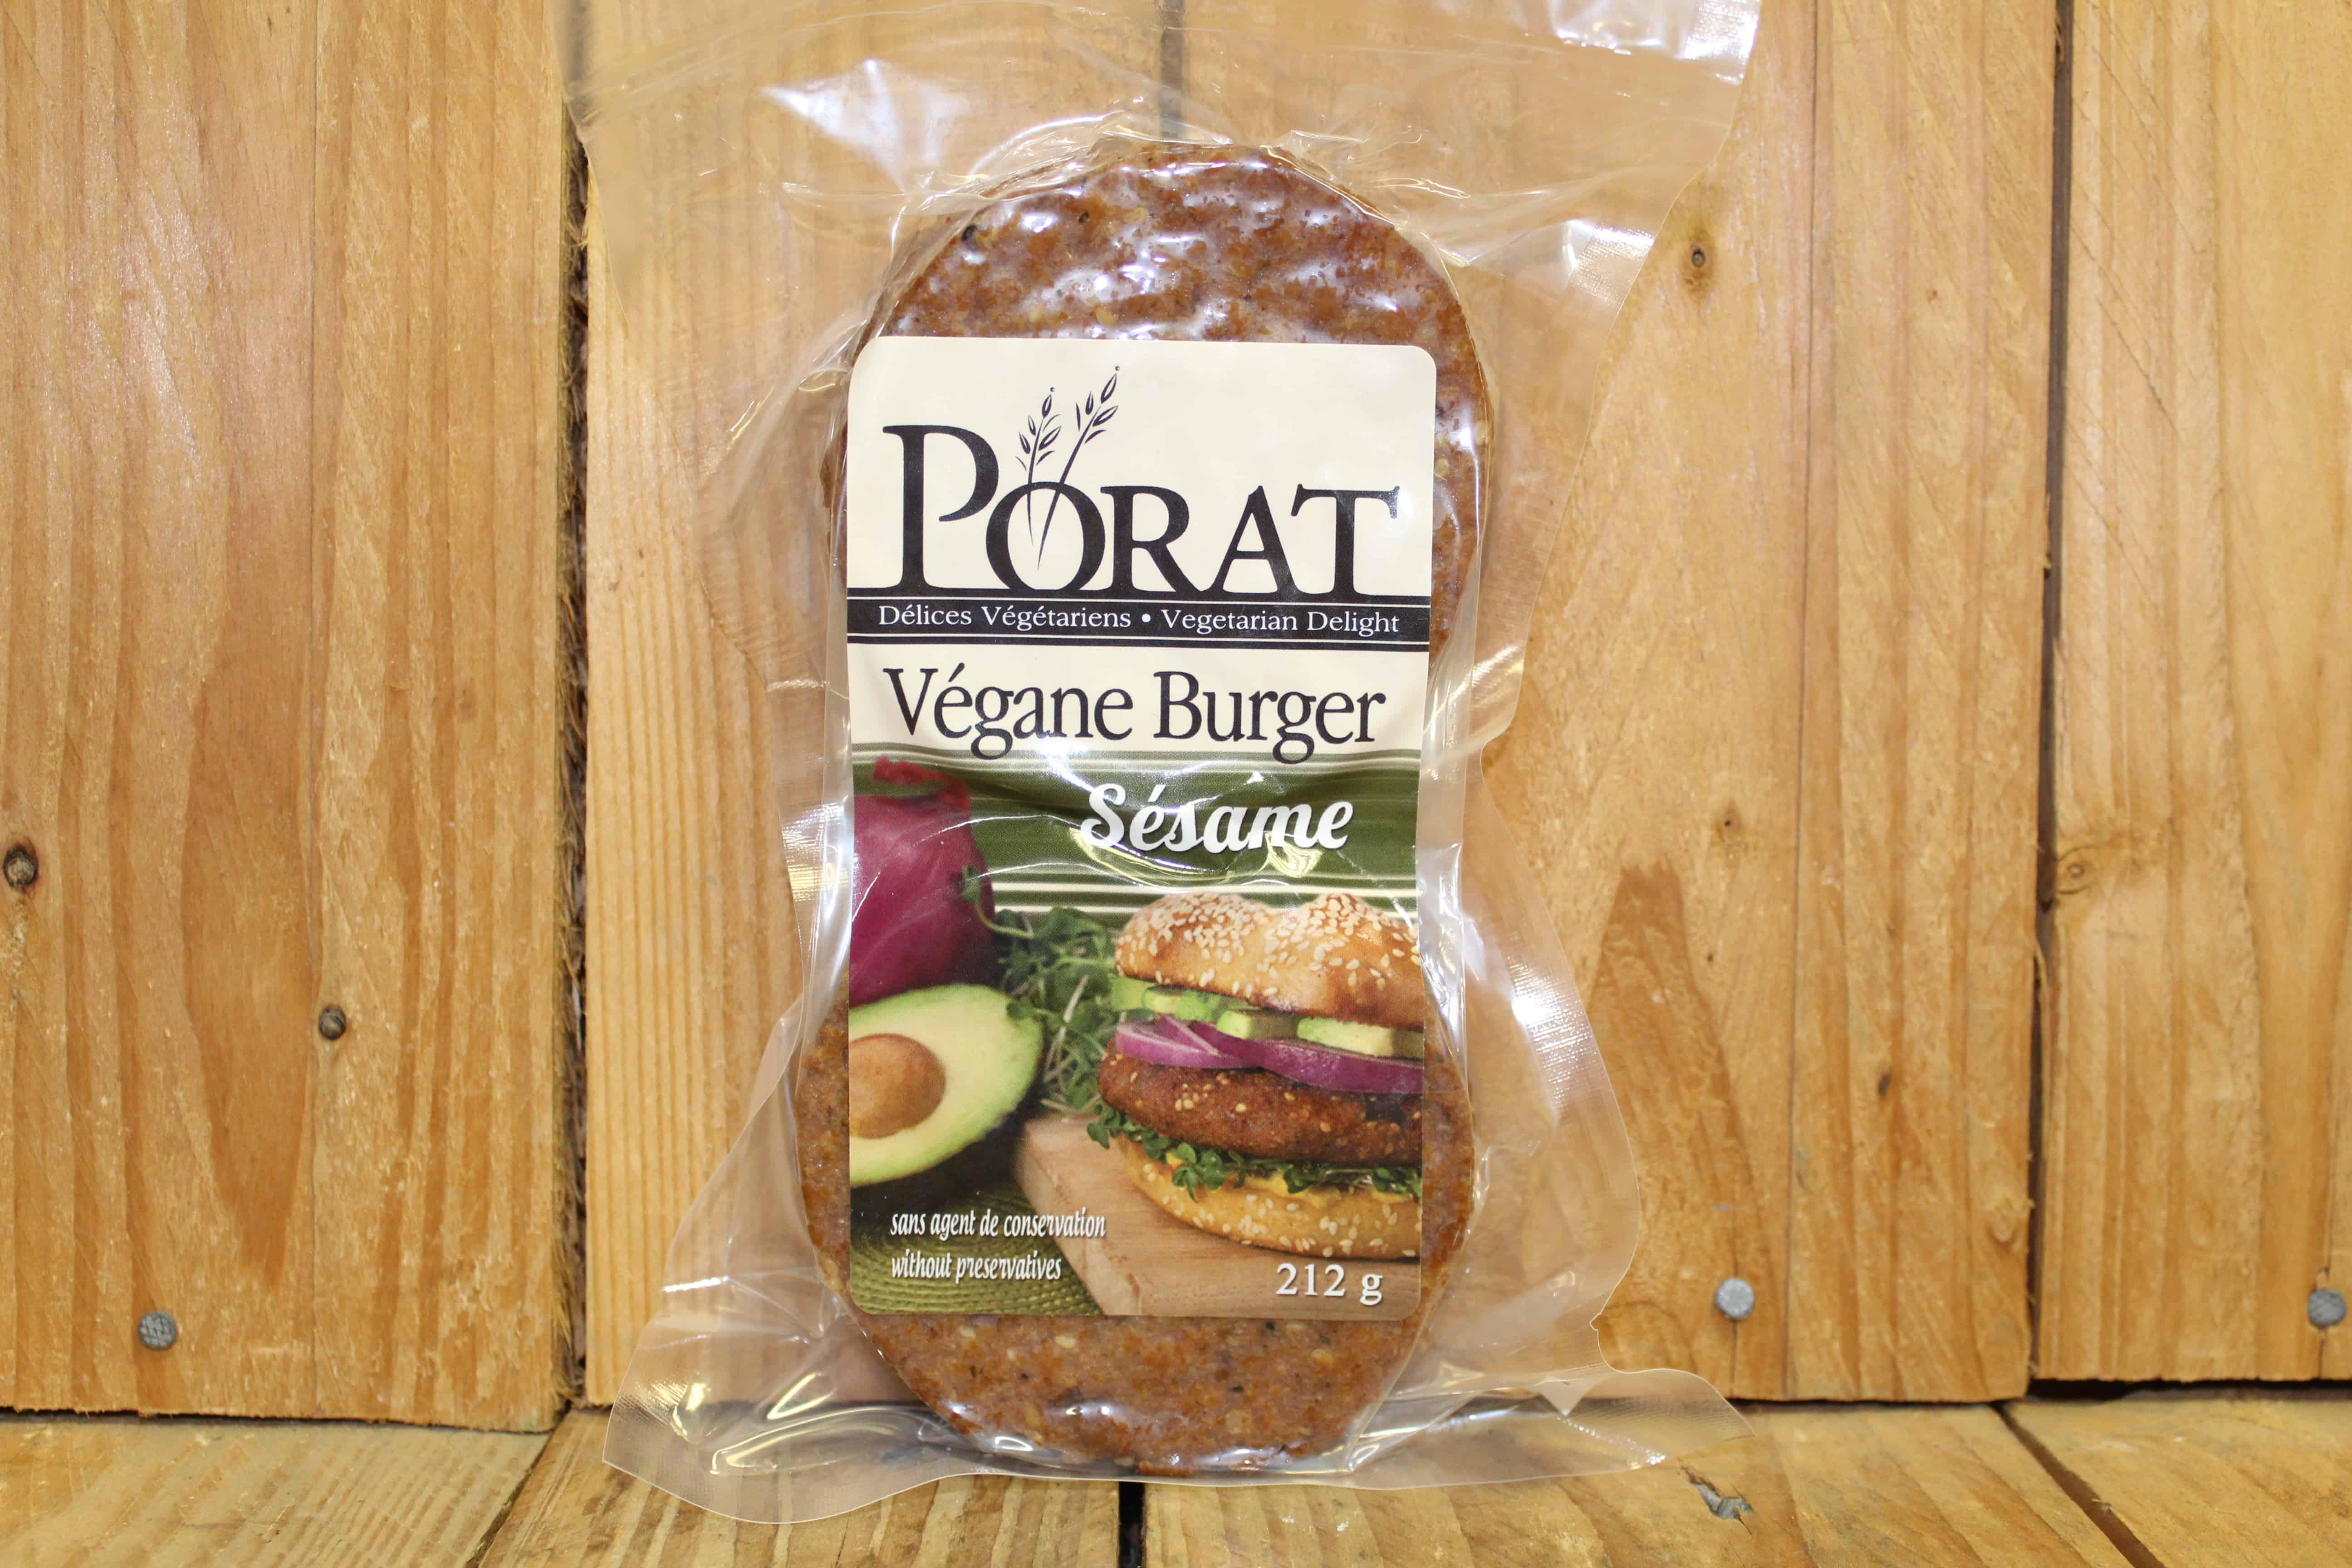 Porat – Vegan Burger – Sesame (224g)